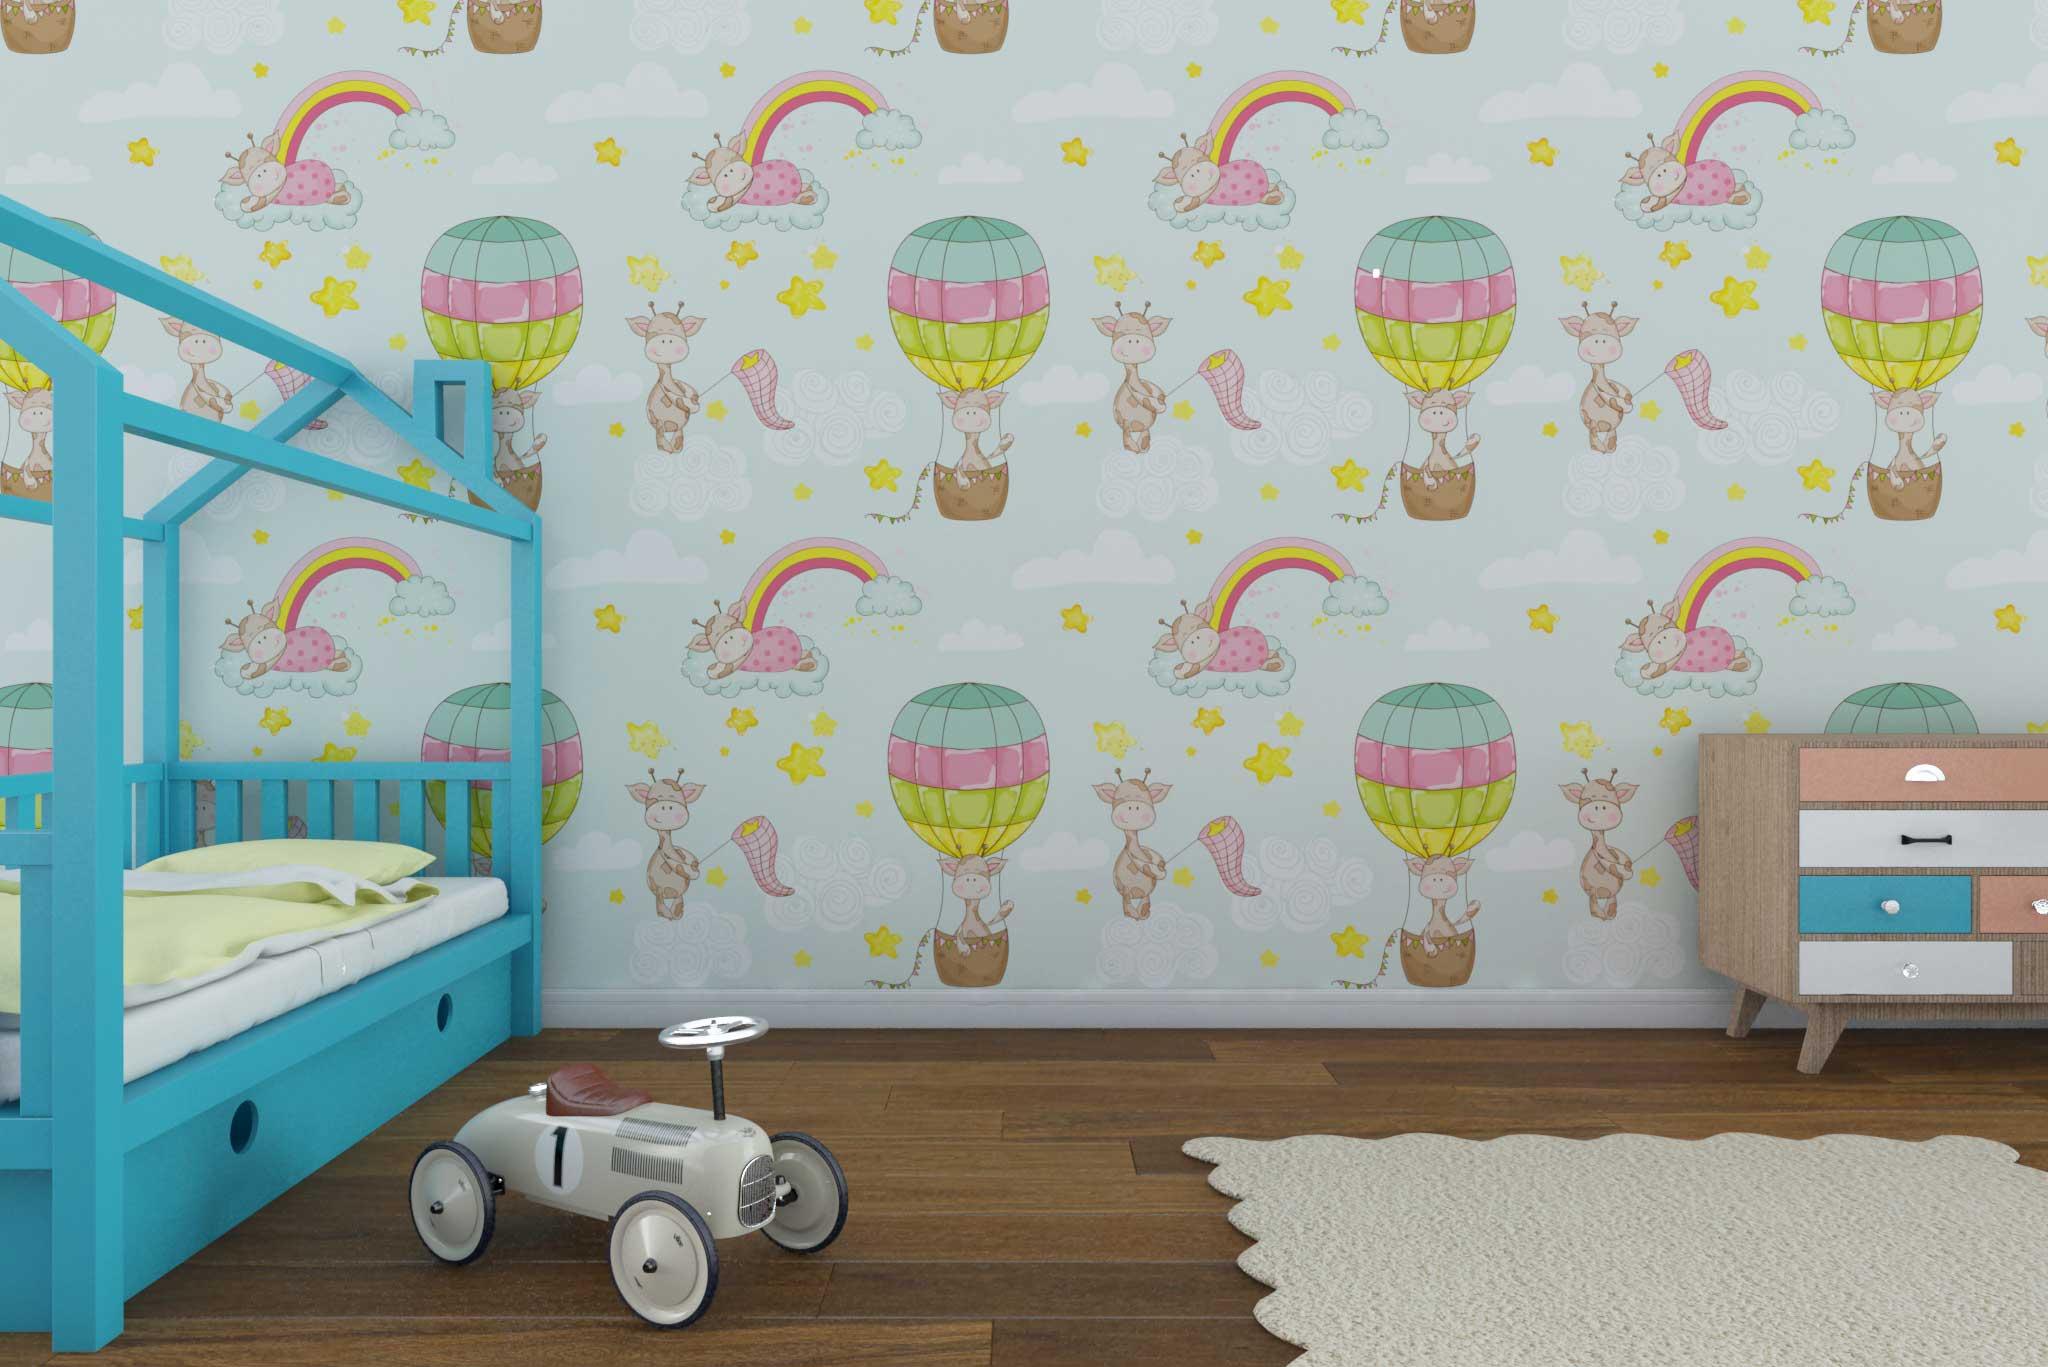 tapet-fototapet-custom-comanda-personalizat-bucuresti-camera-copii-model-baloane-aer-cald-multicolor-girafe